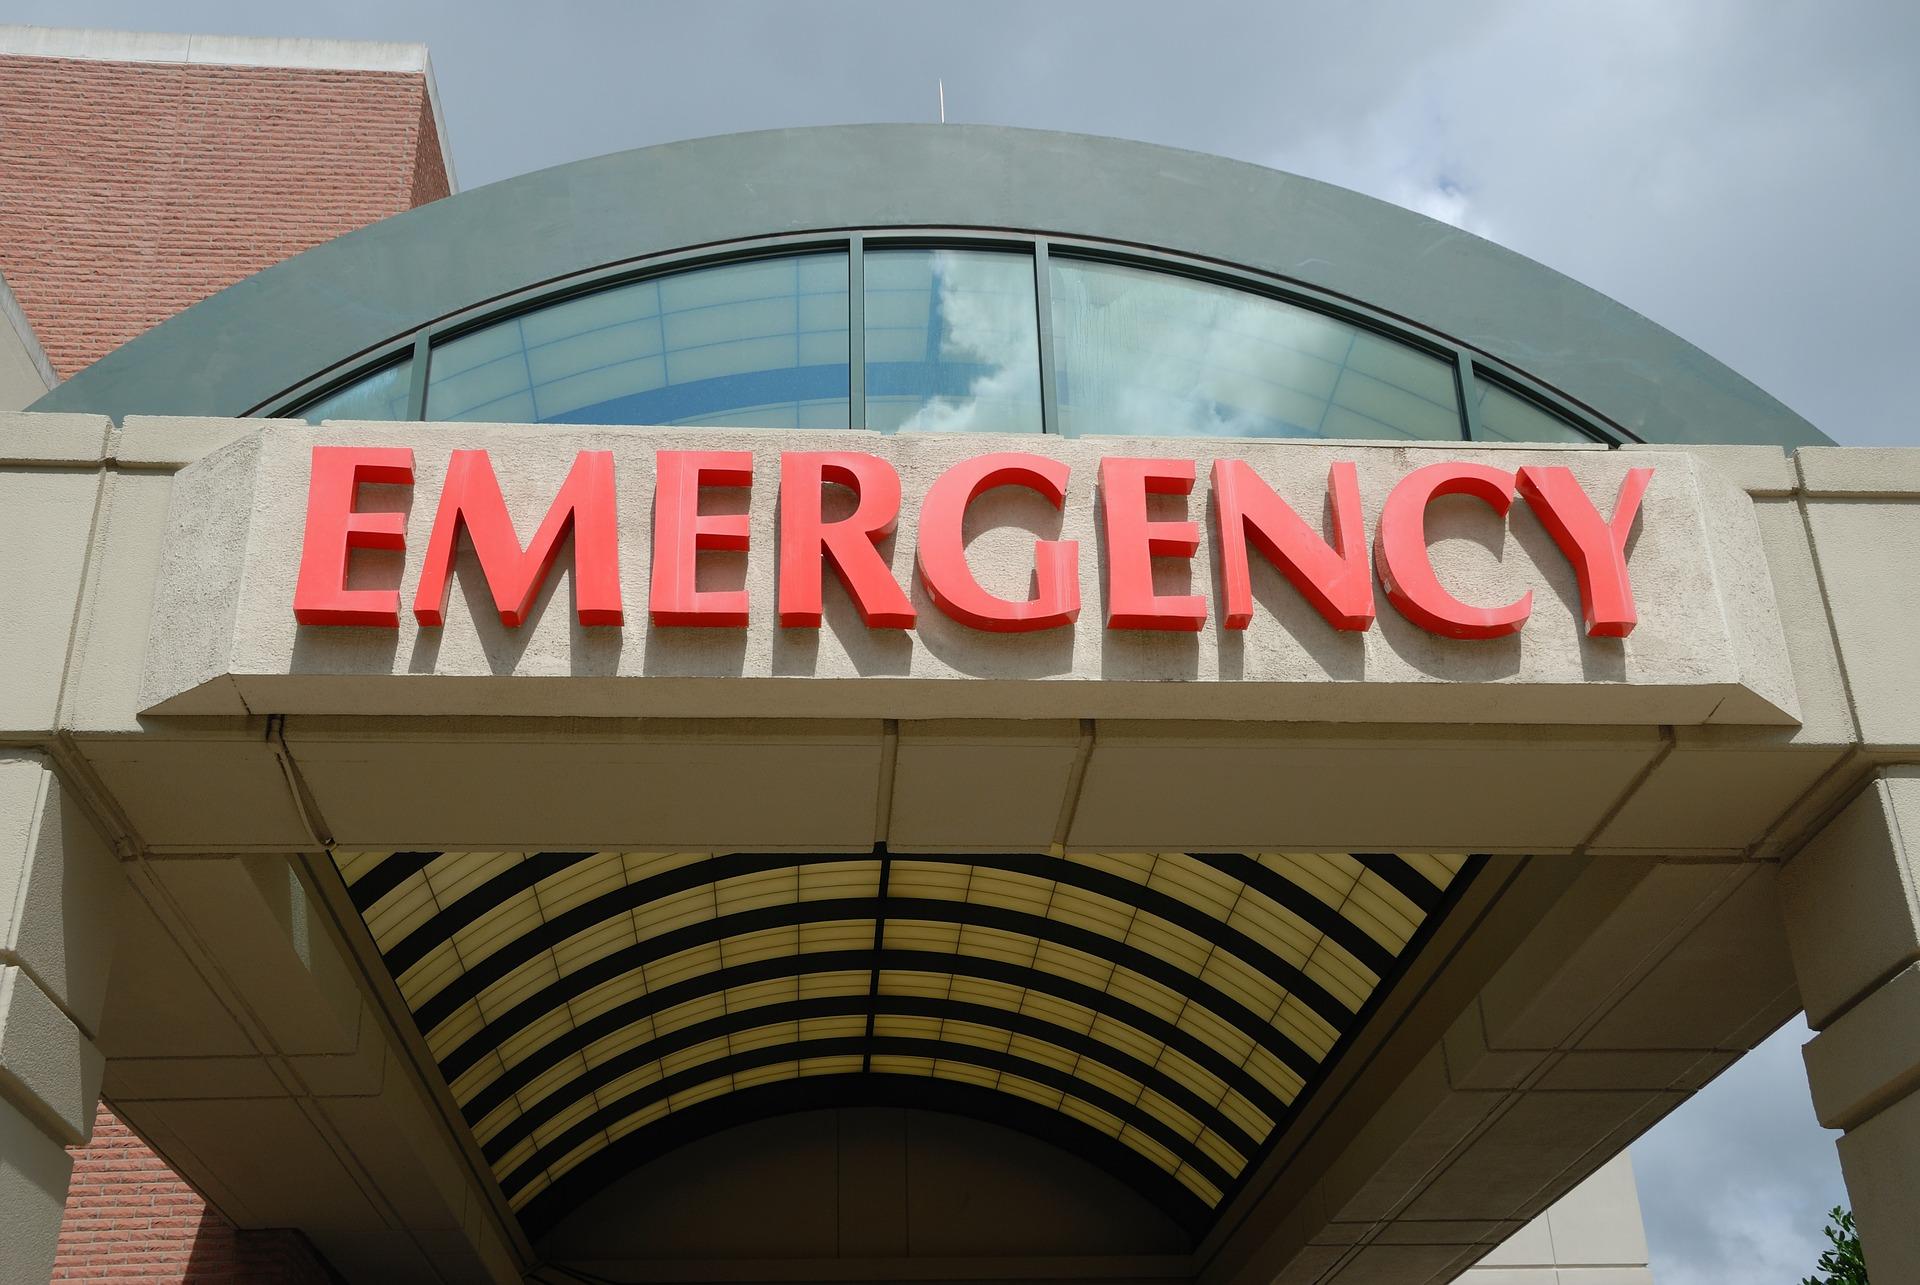 hospital-1636334_1920.jpg